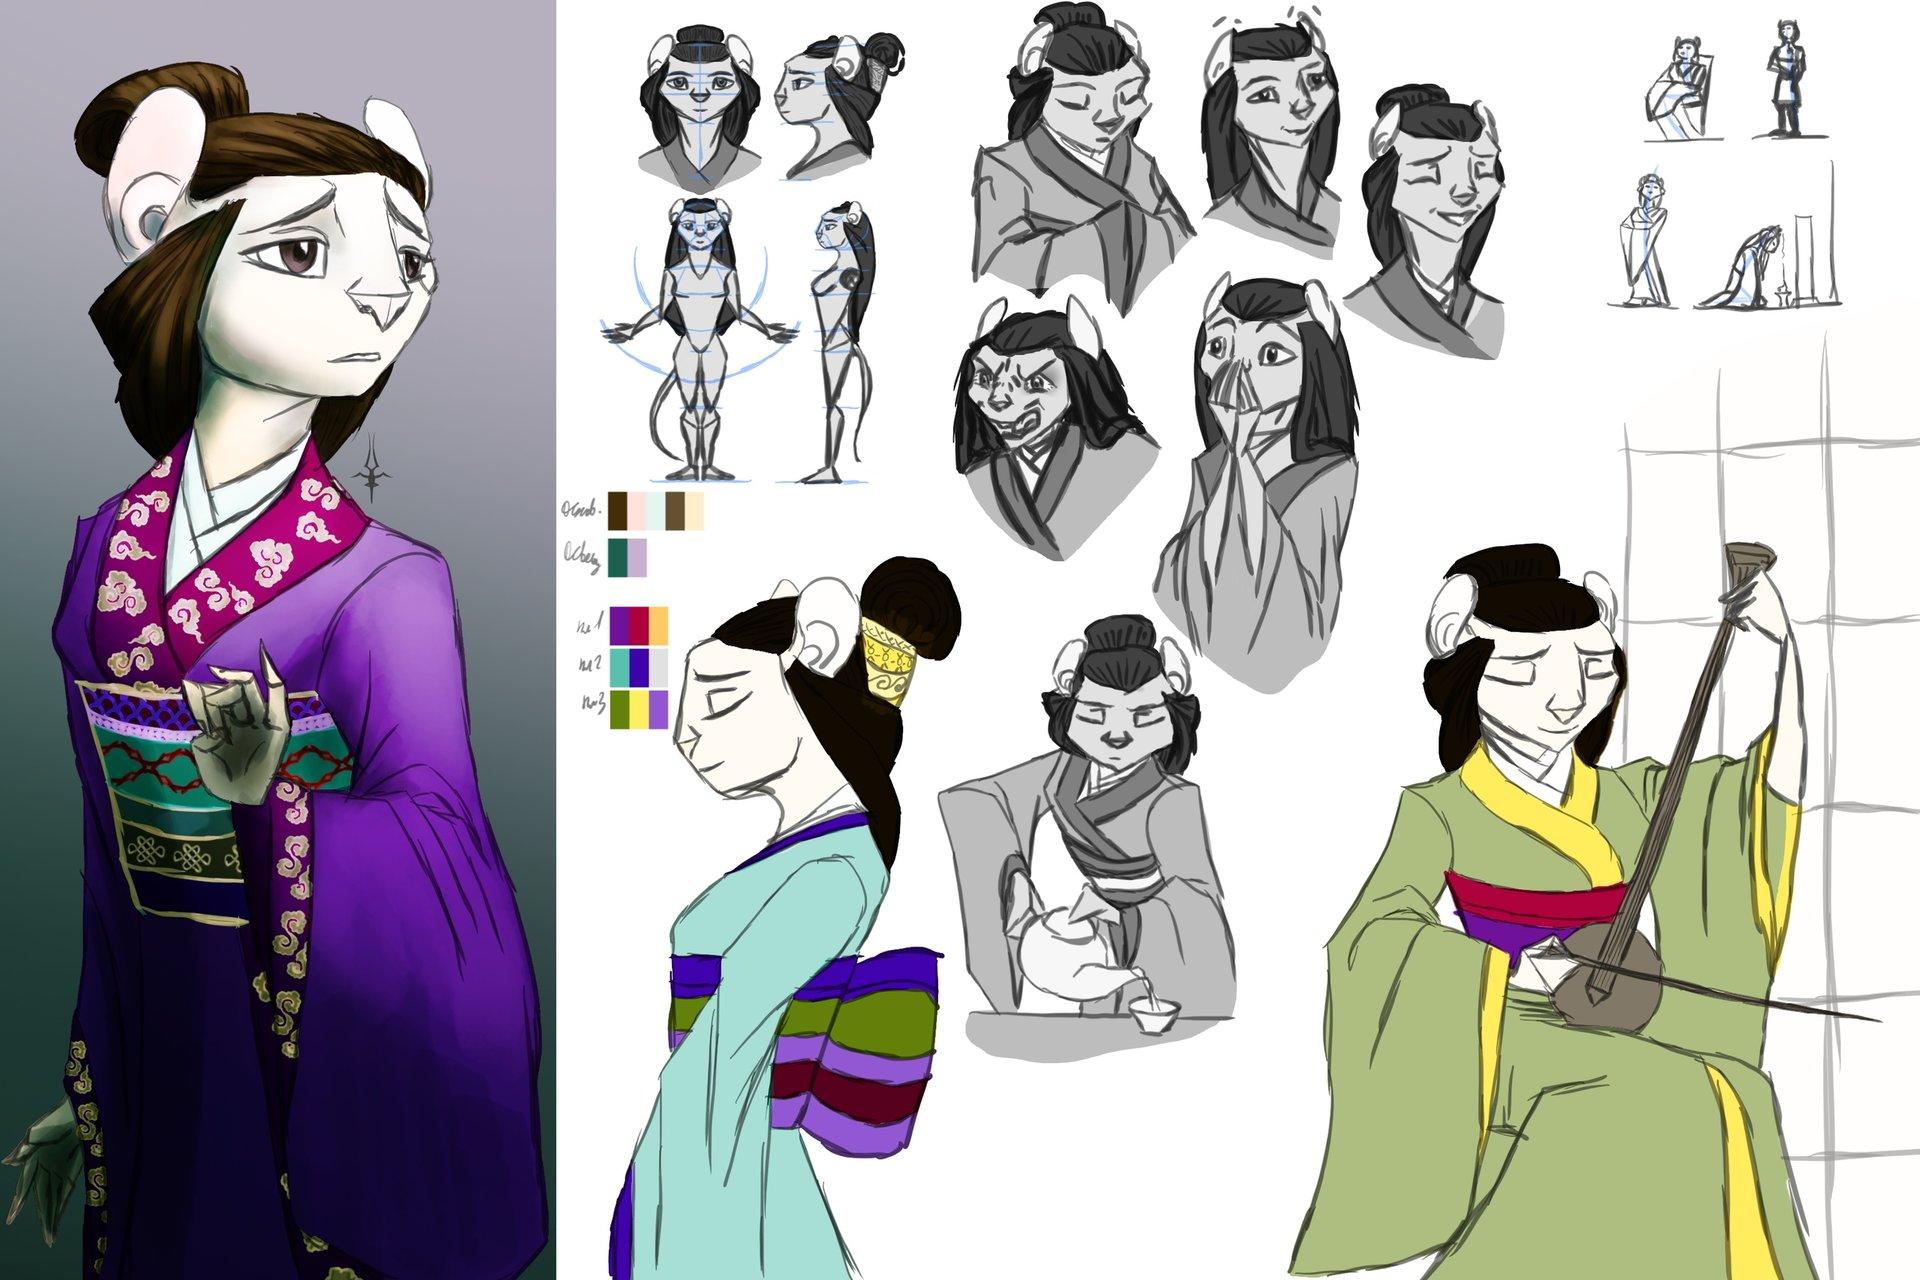 Карточка персонажа - Сима Хасима (Екуозу)